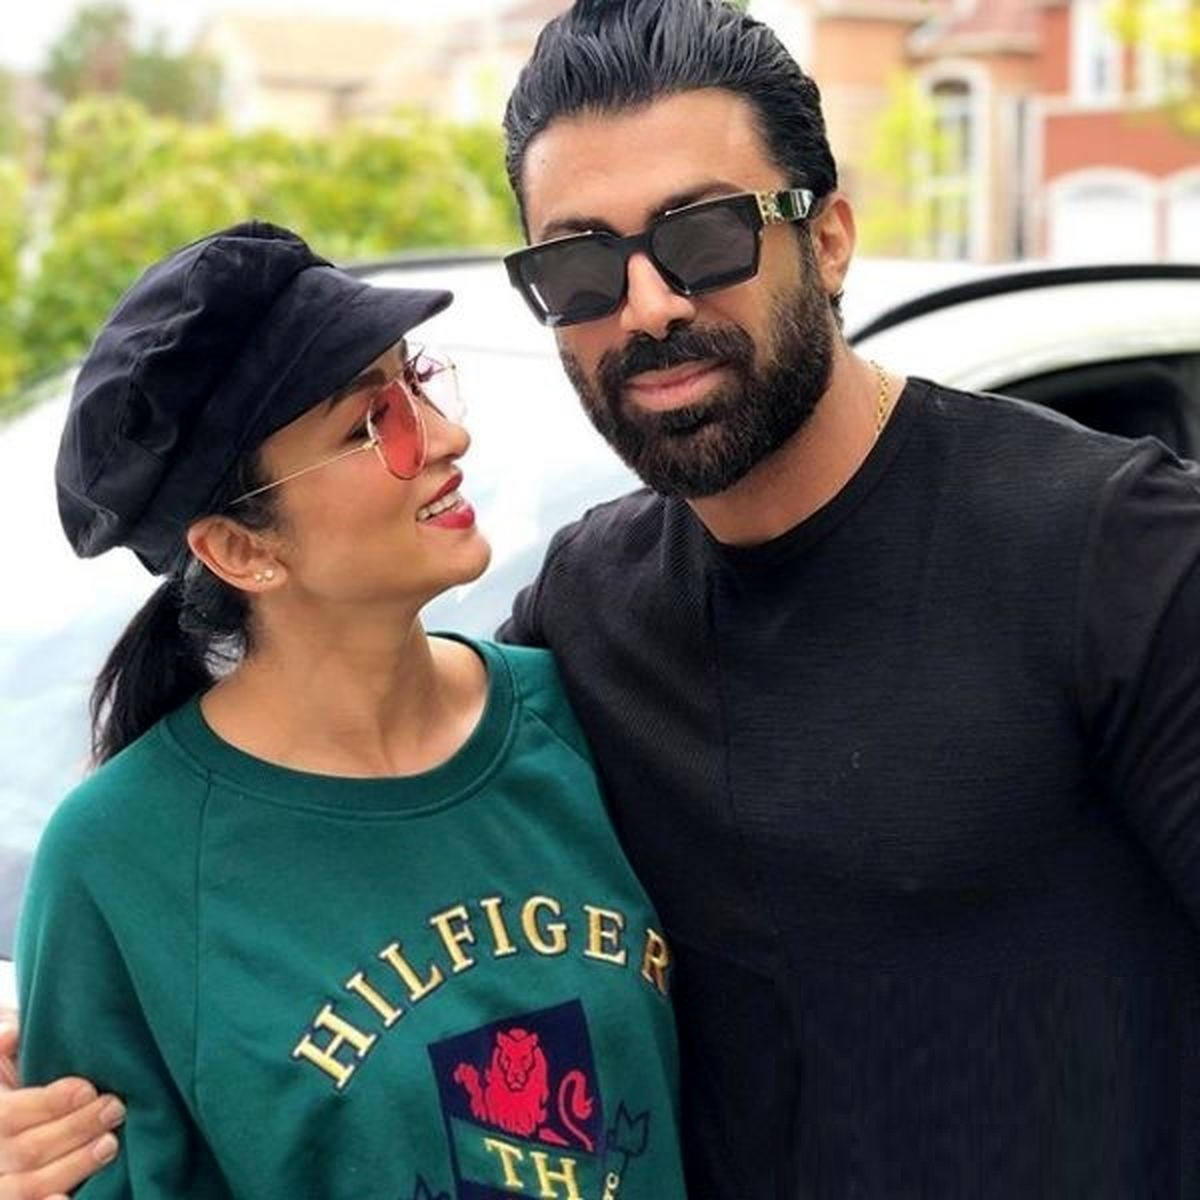 عکسهای جنجالی روناک یونسی و همسرش+ عکس